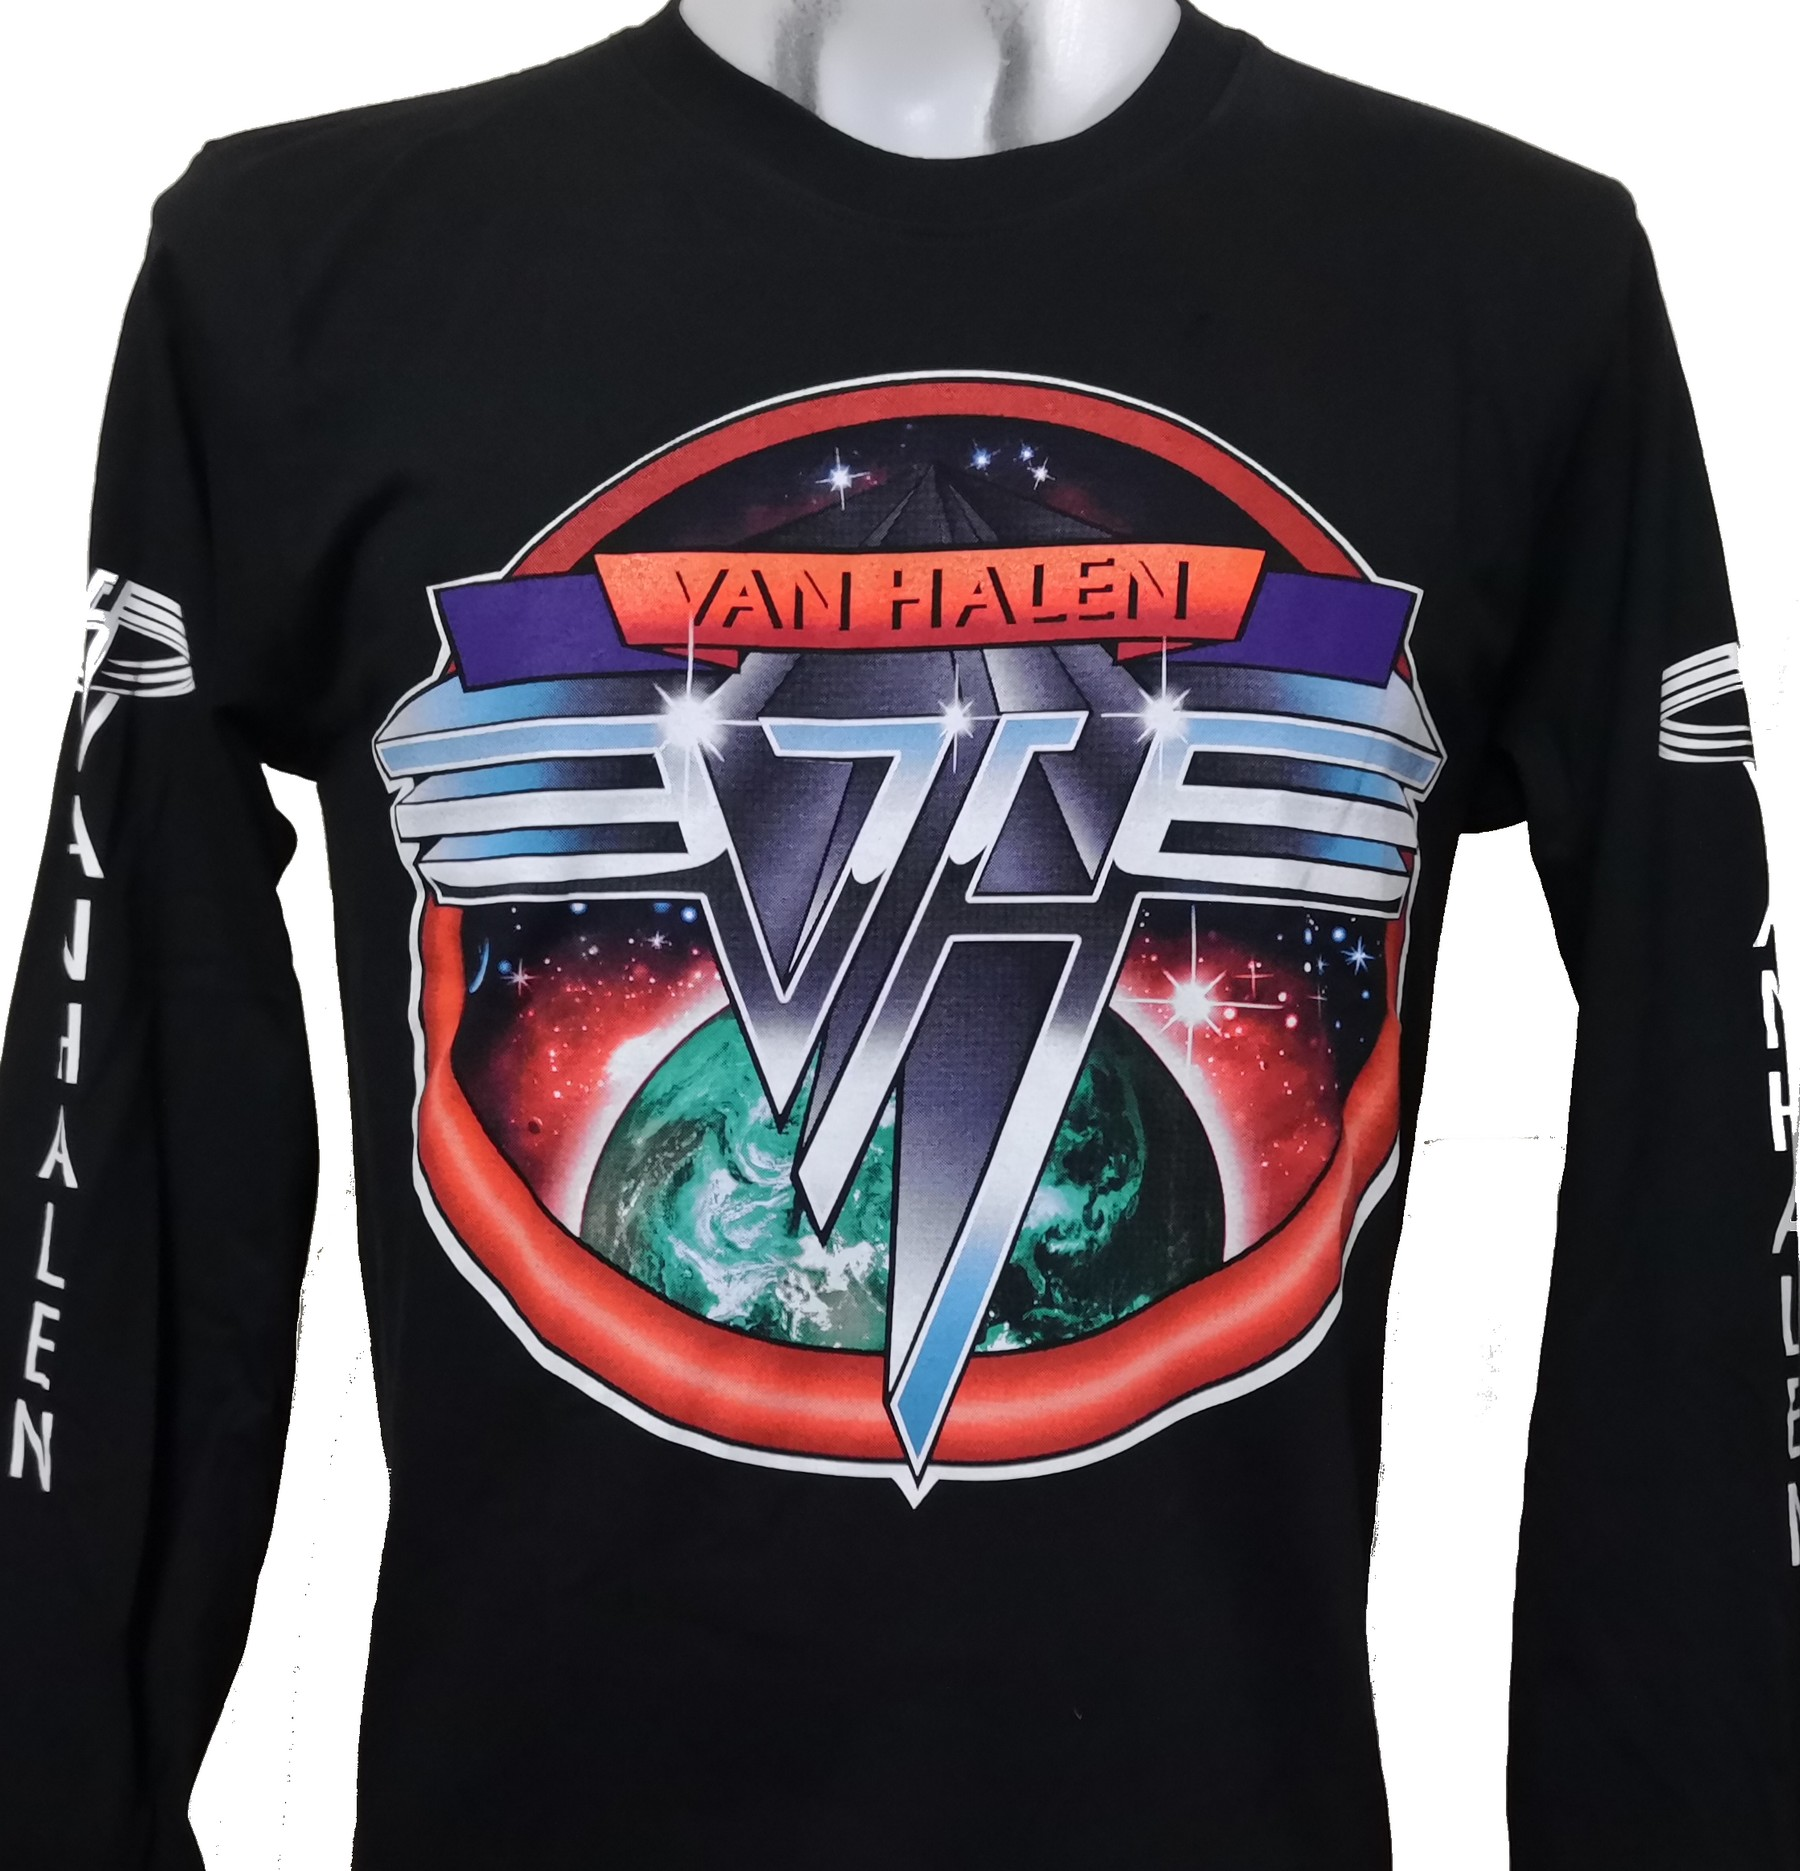 New Eddie Van Halen RARE Long Sleeve Shirt Size S M L XL 2XL P364